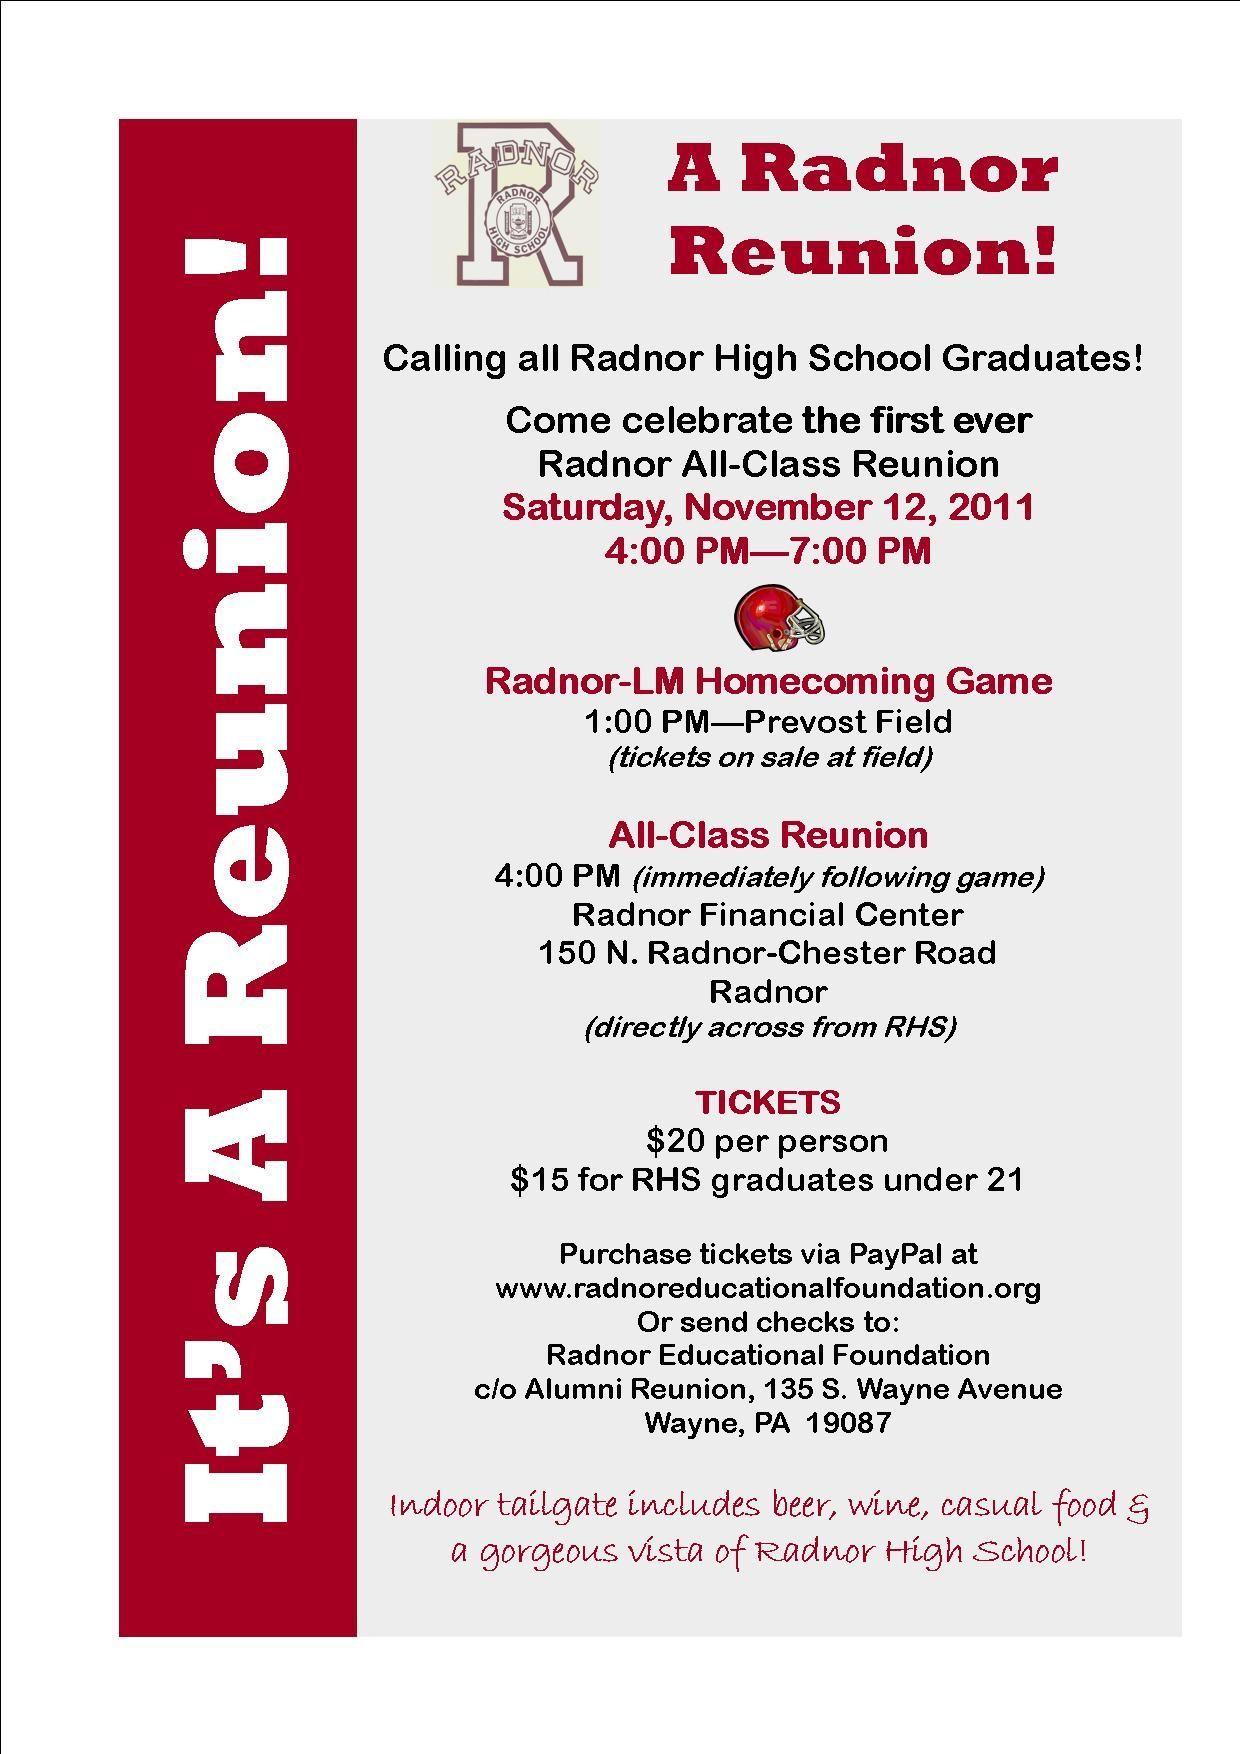 The Enchanting Class Reunion Invitations Invitations Class Reunion Pertaining To R Reunion Invitations Family Reunion Invitations Class Reunion Invitations